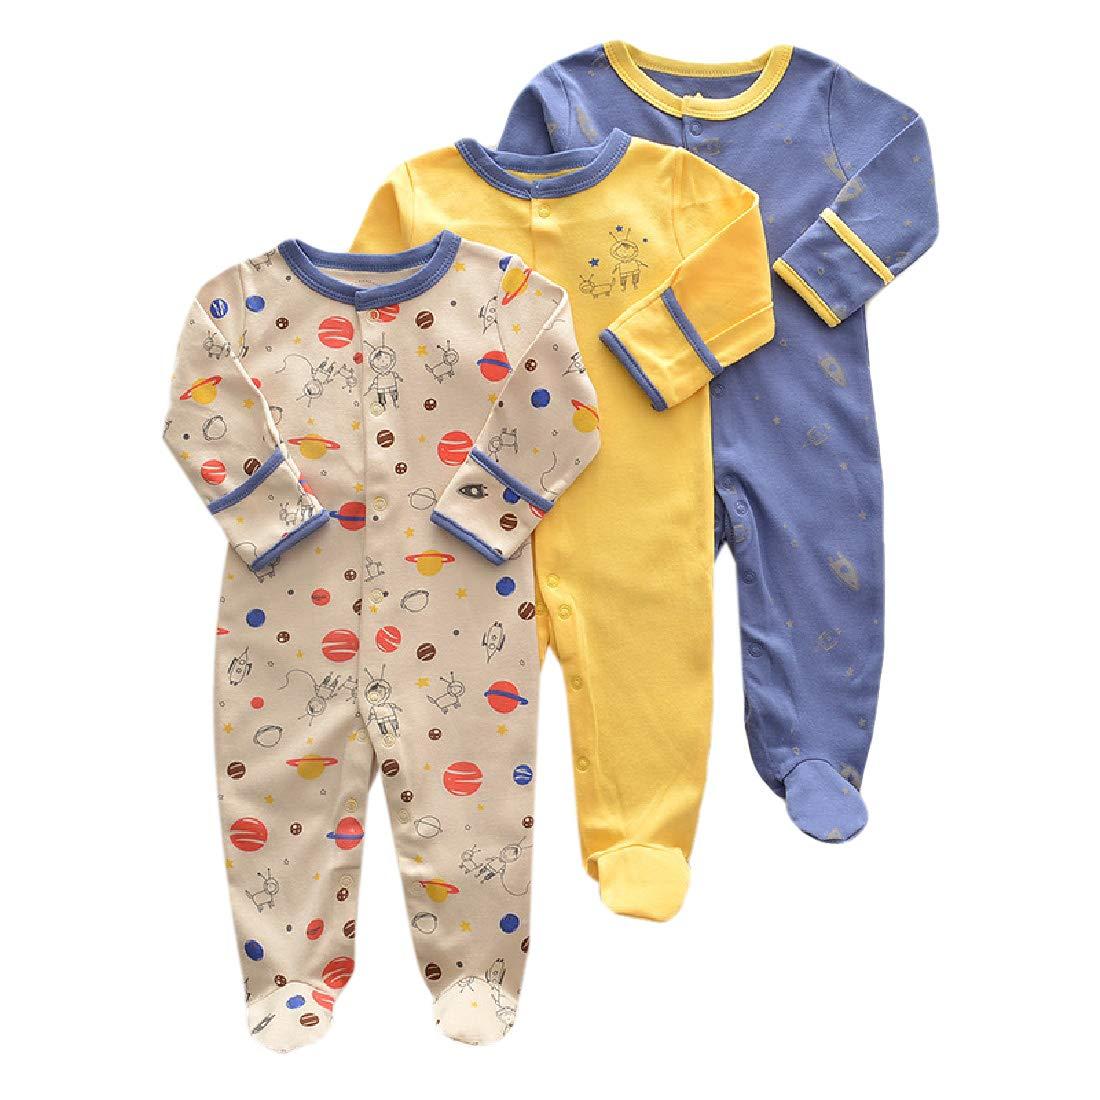 Zimaes Newborn Baby Cotton Set of 3 Long-Sleeve Romper Bodysuit Jumpsuit